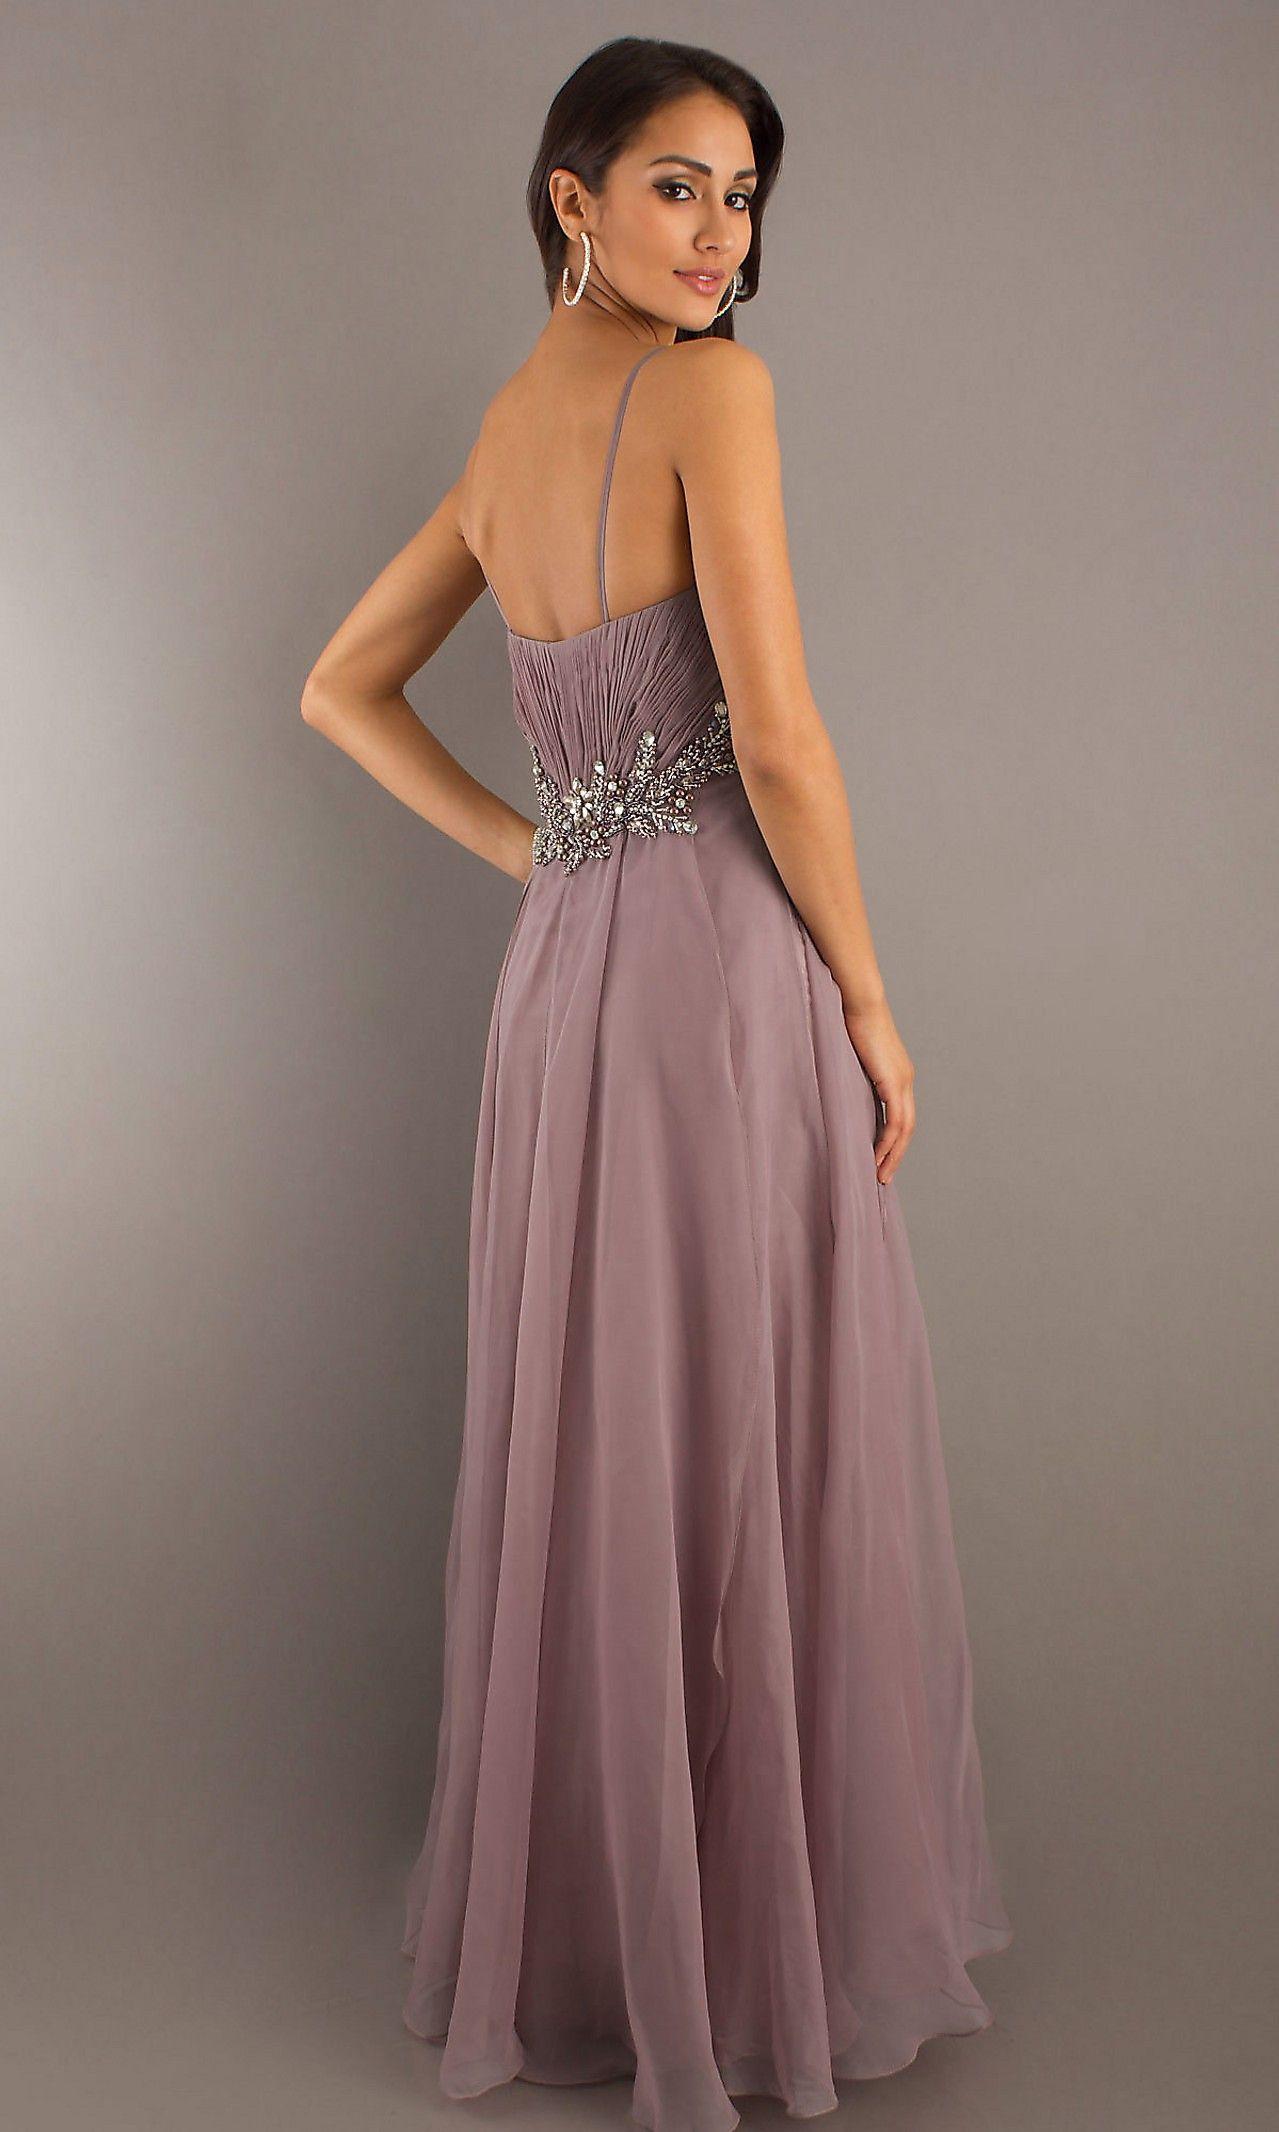 petite-good-dresses